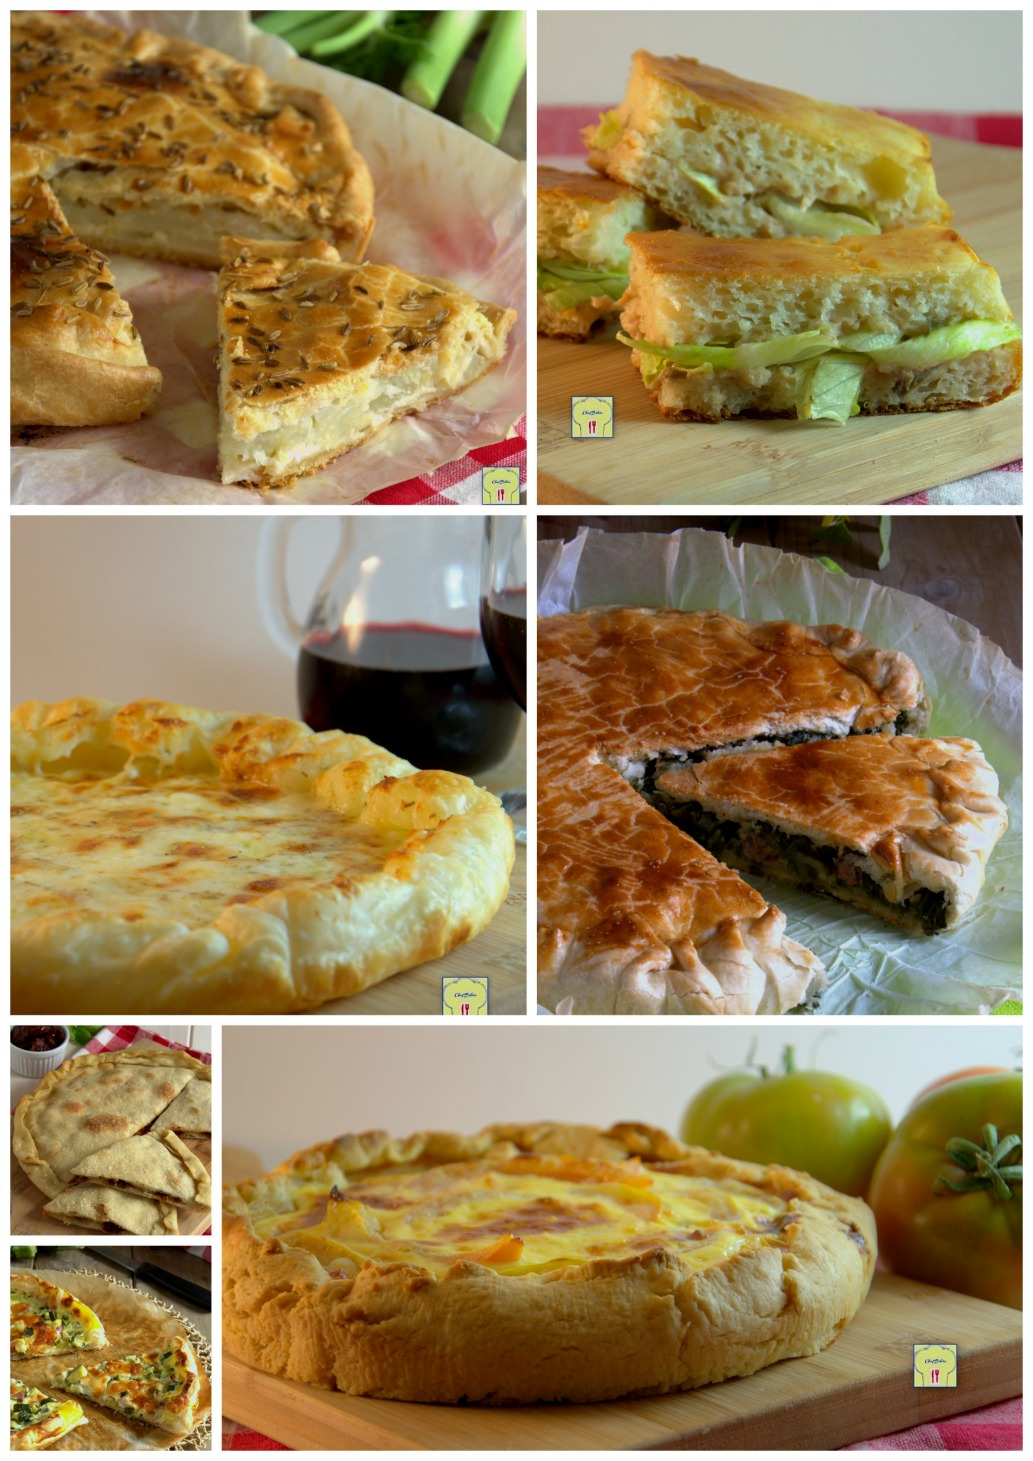 Torte salate per pic nic 7 ricette facili for Torte salate facili